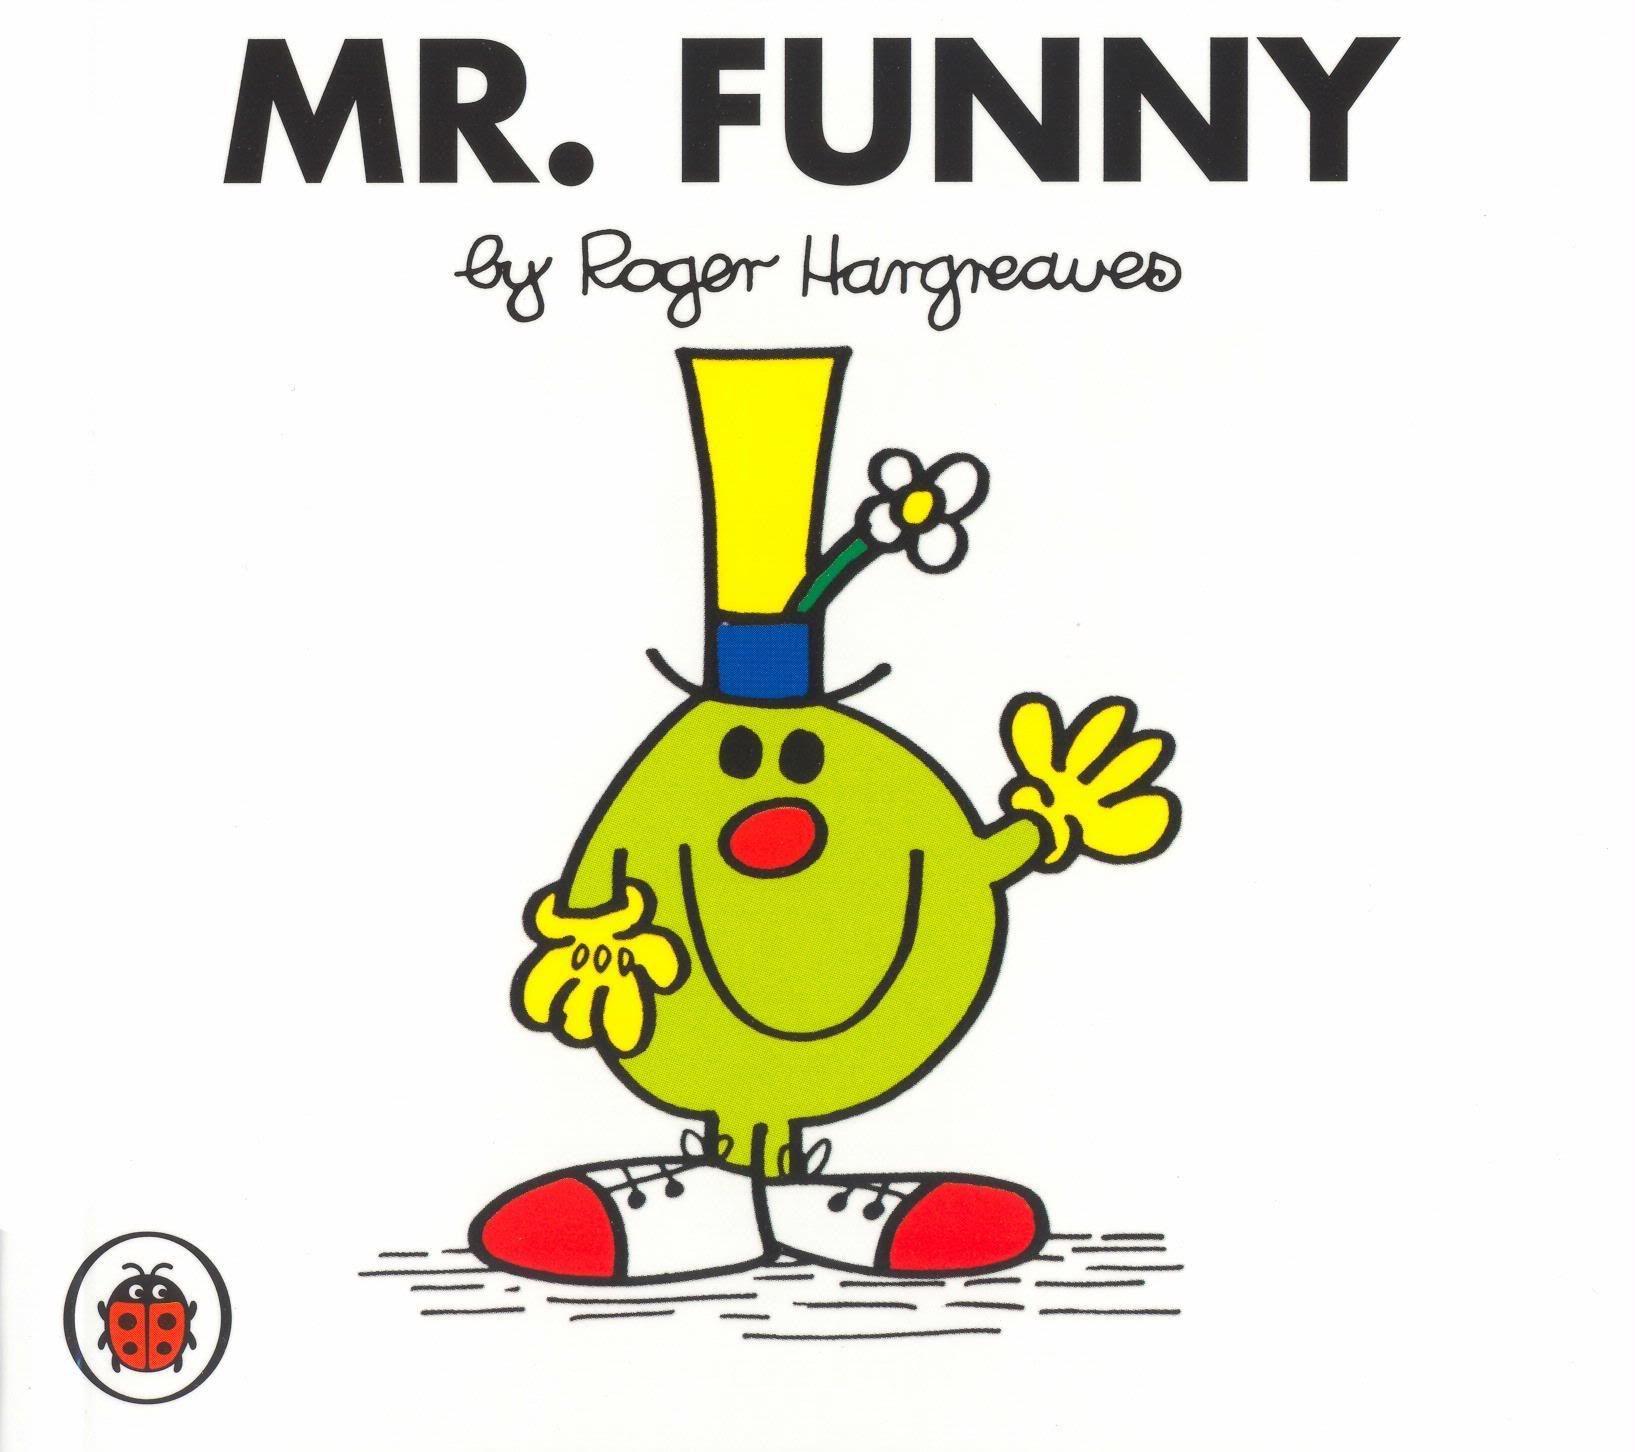 File:Mr. Funny.jpg